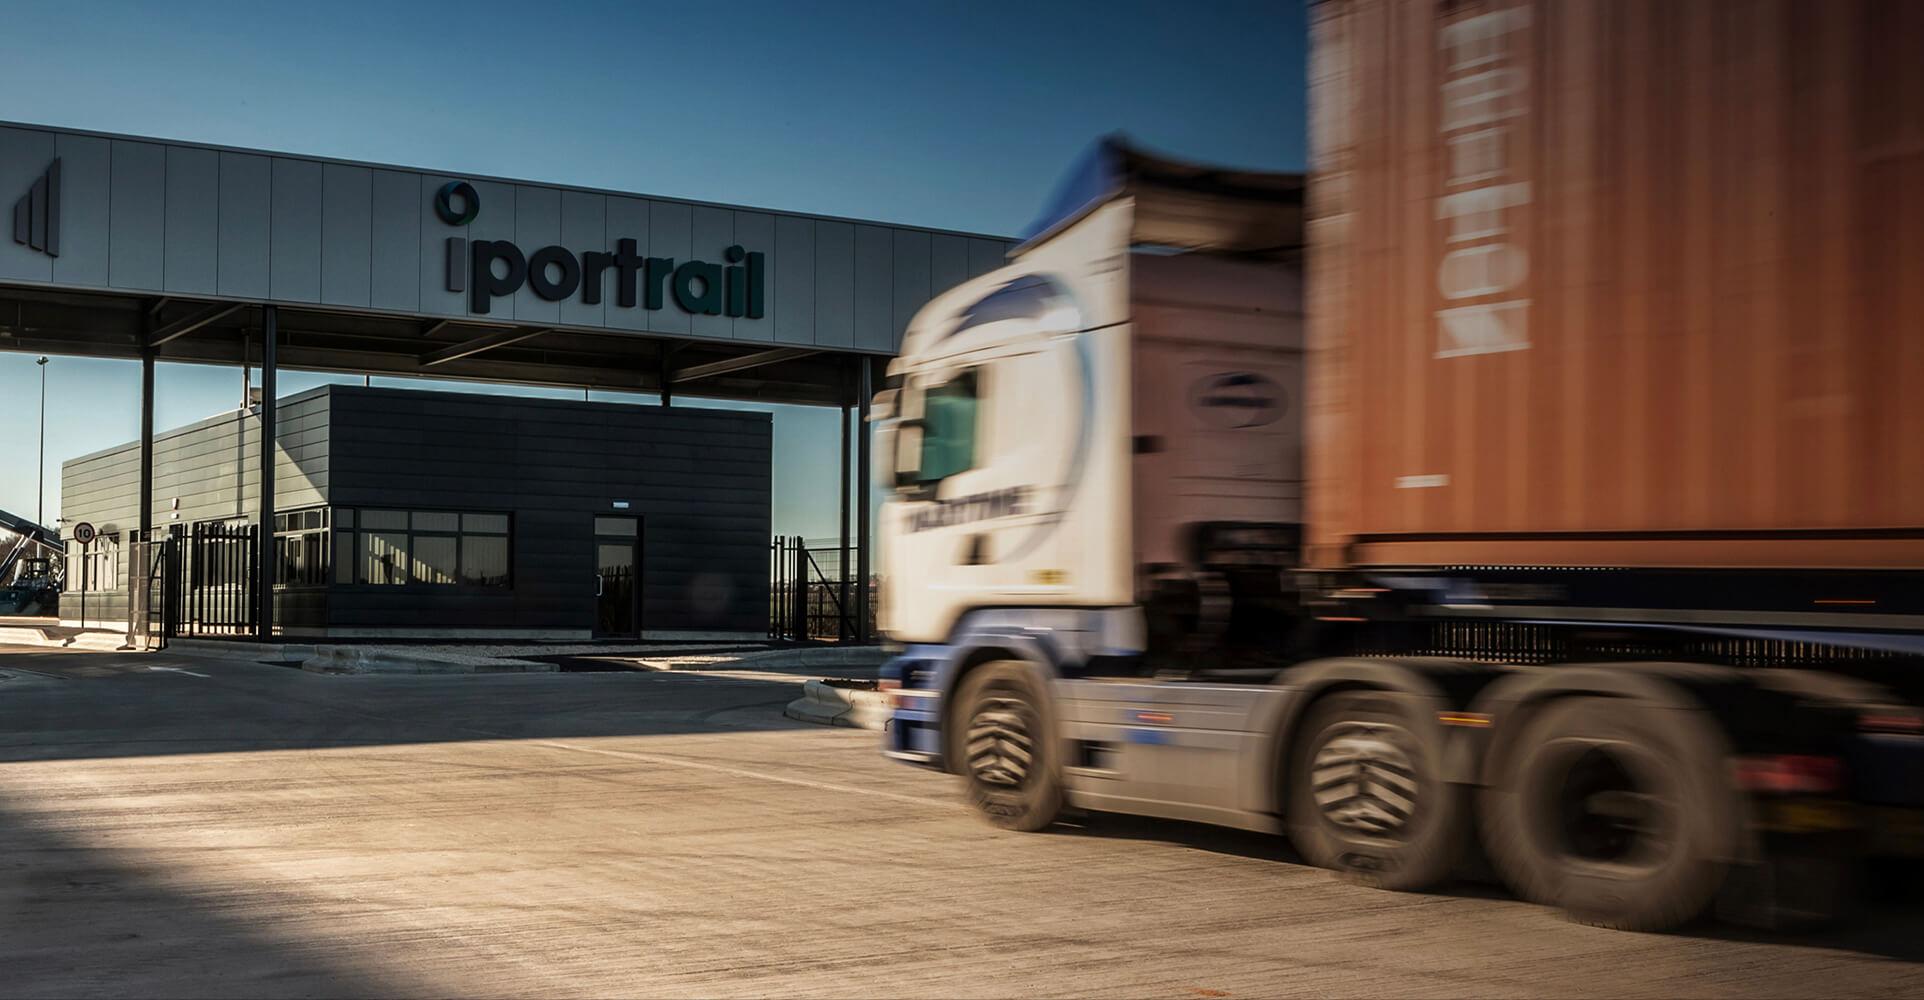 Market-leading customs facilities